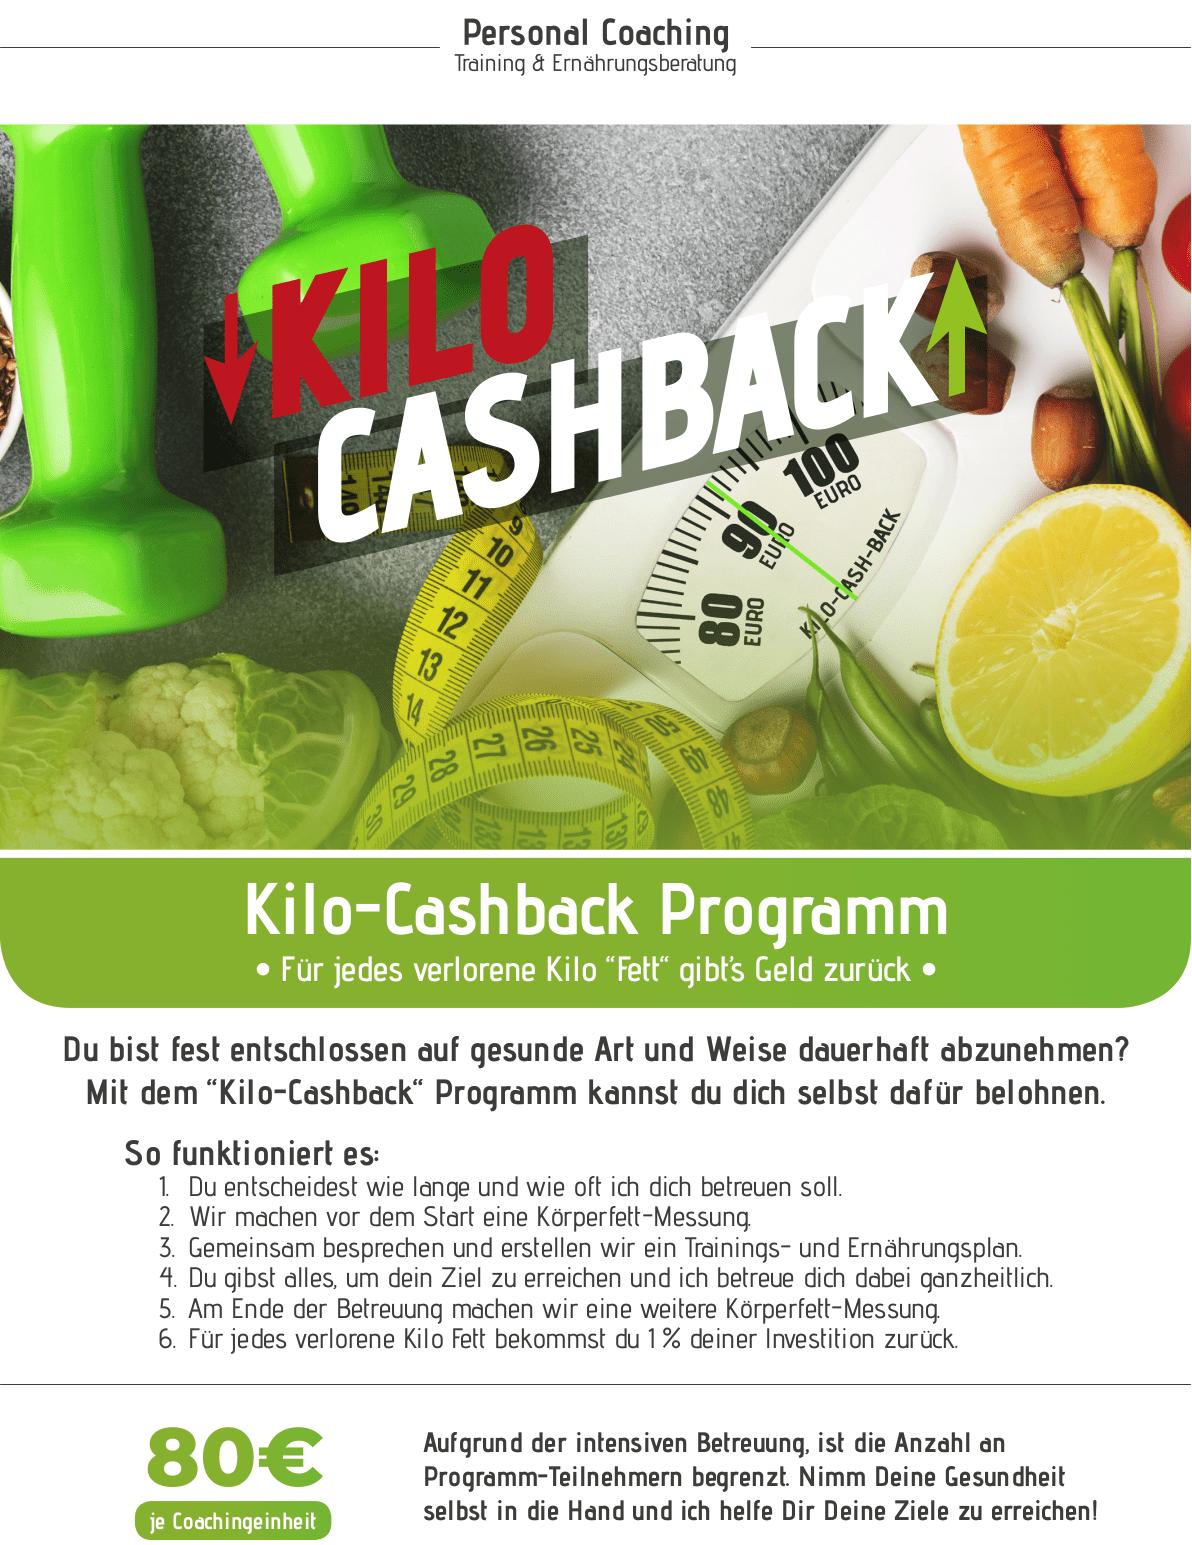 Kilo-Cashback-Programm